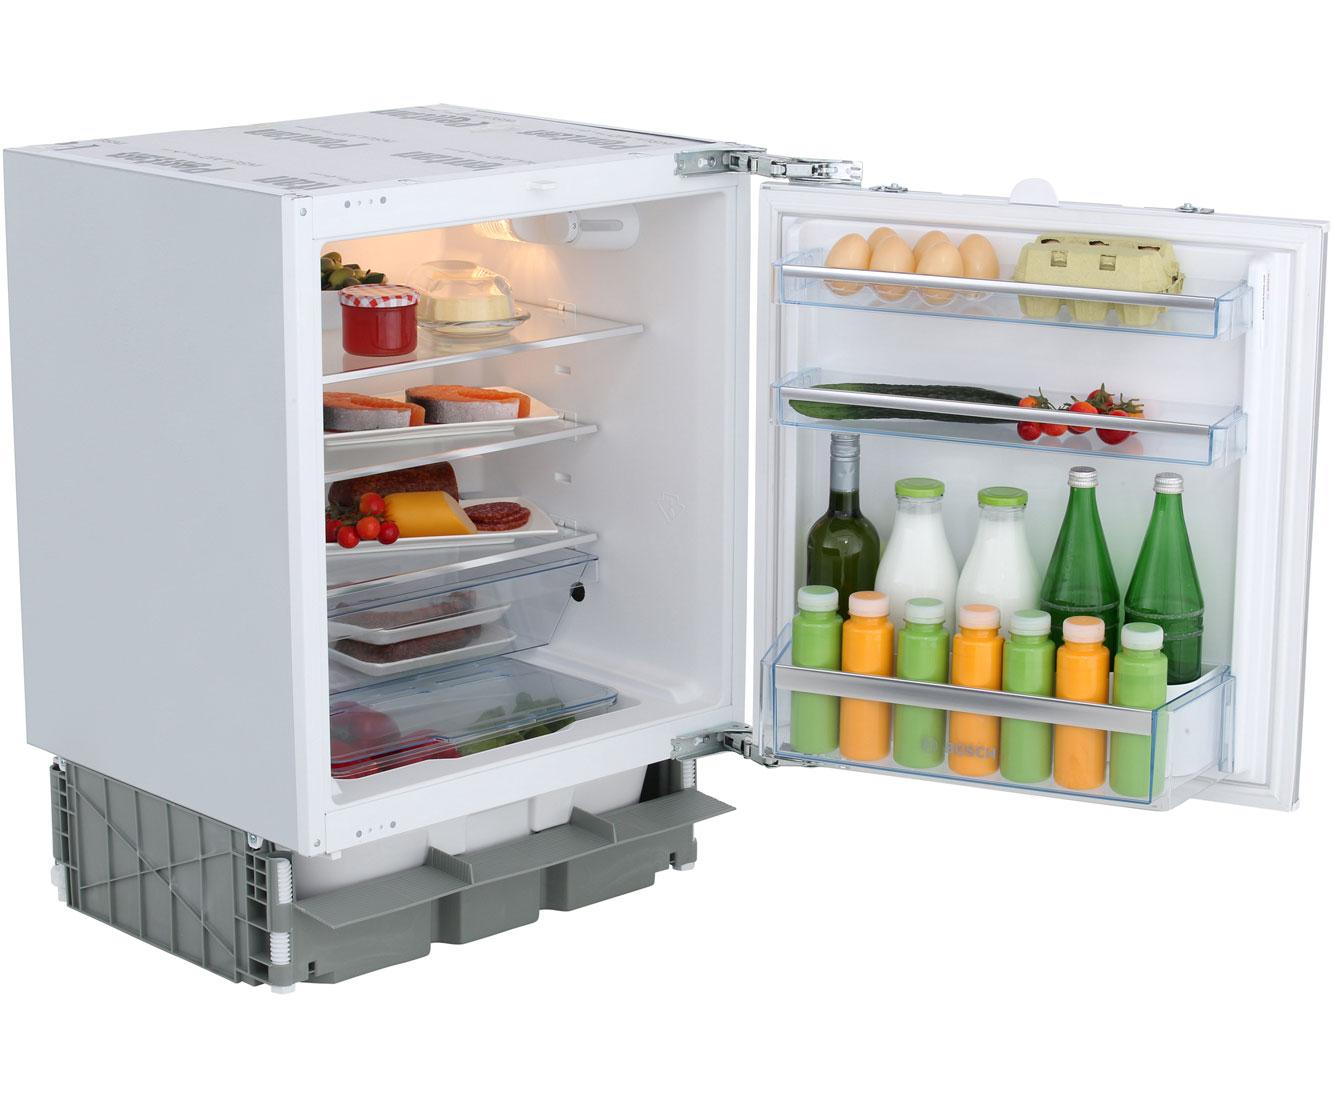 Bosch Kühlschrank Biofresh : Bosch kühlschrank glasfront weiß bosch kan lb ab u ac